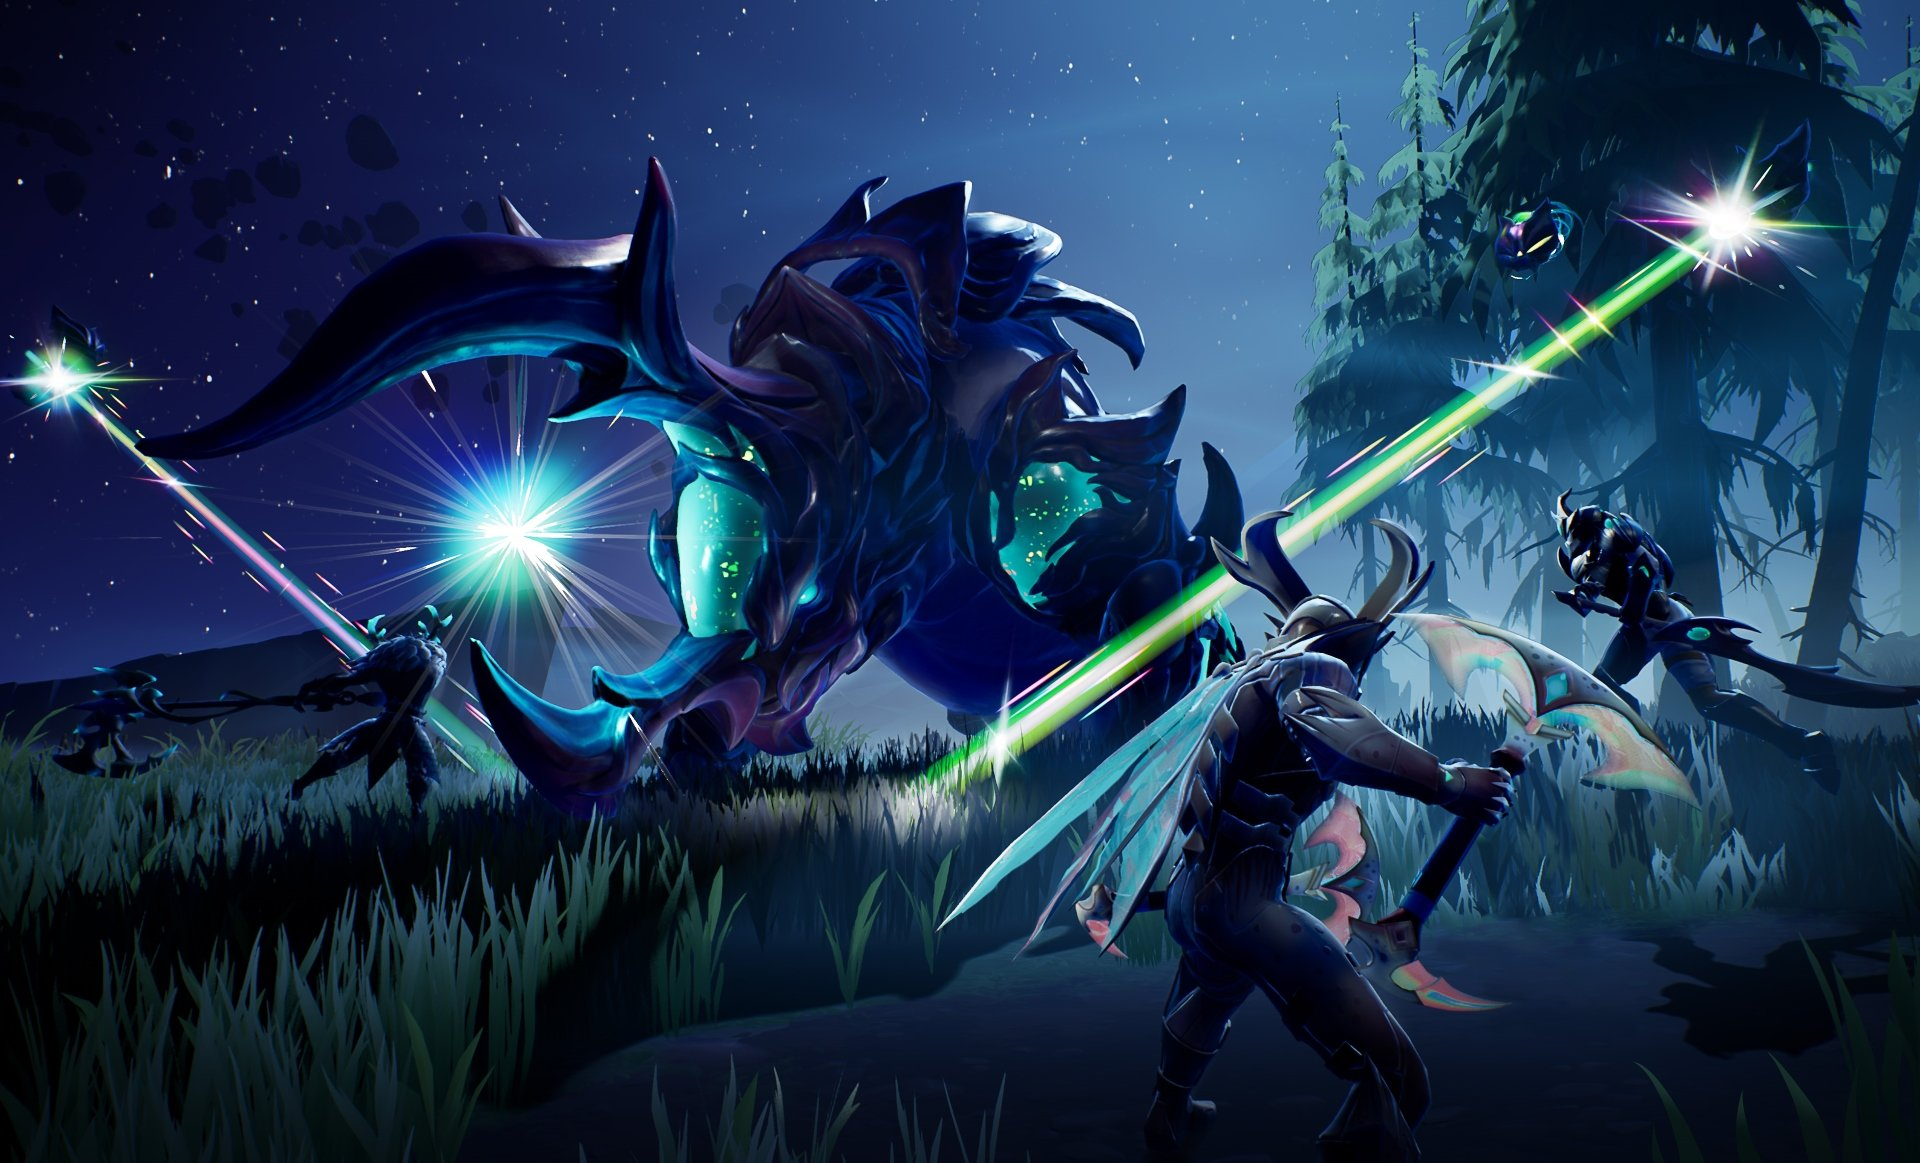 Valomyr - All Behemoths in Dauntless